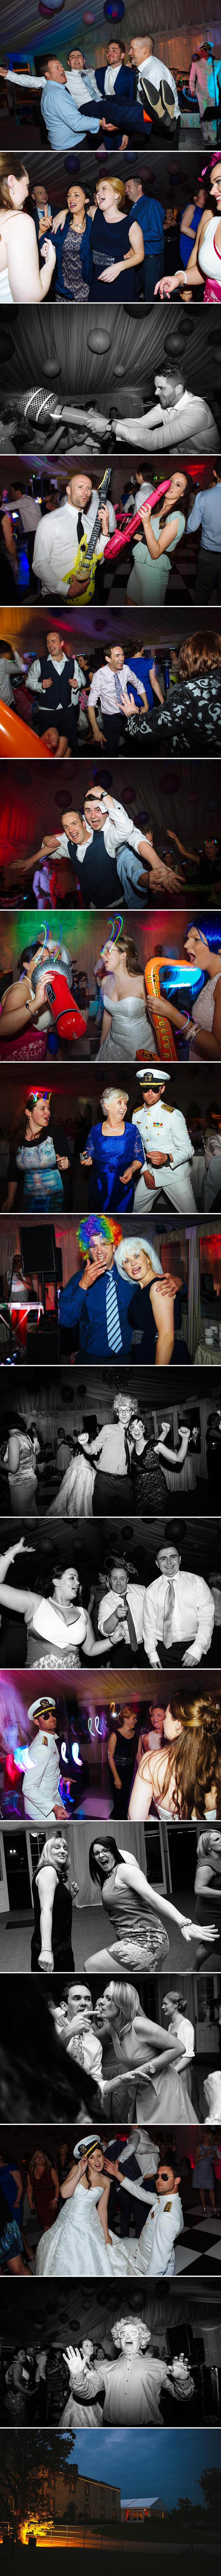 clonabreany house wedding irish wedding photographers 13